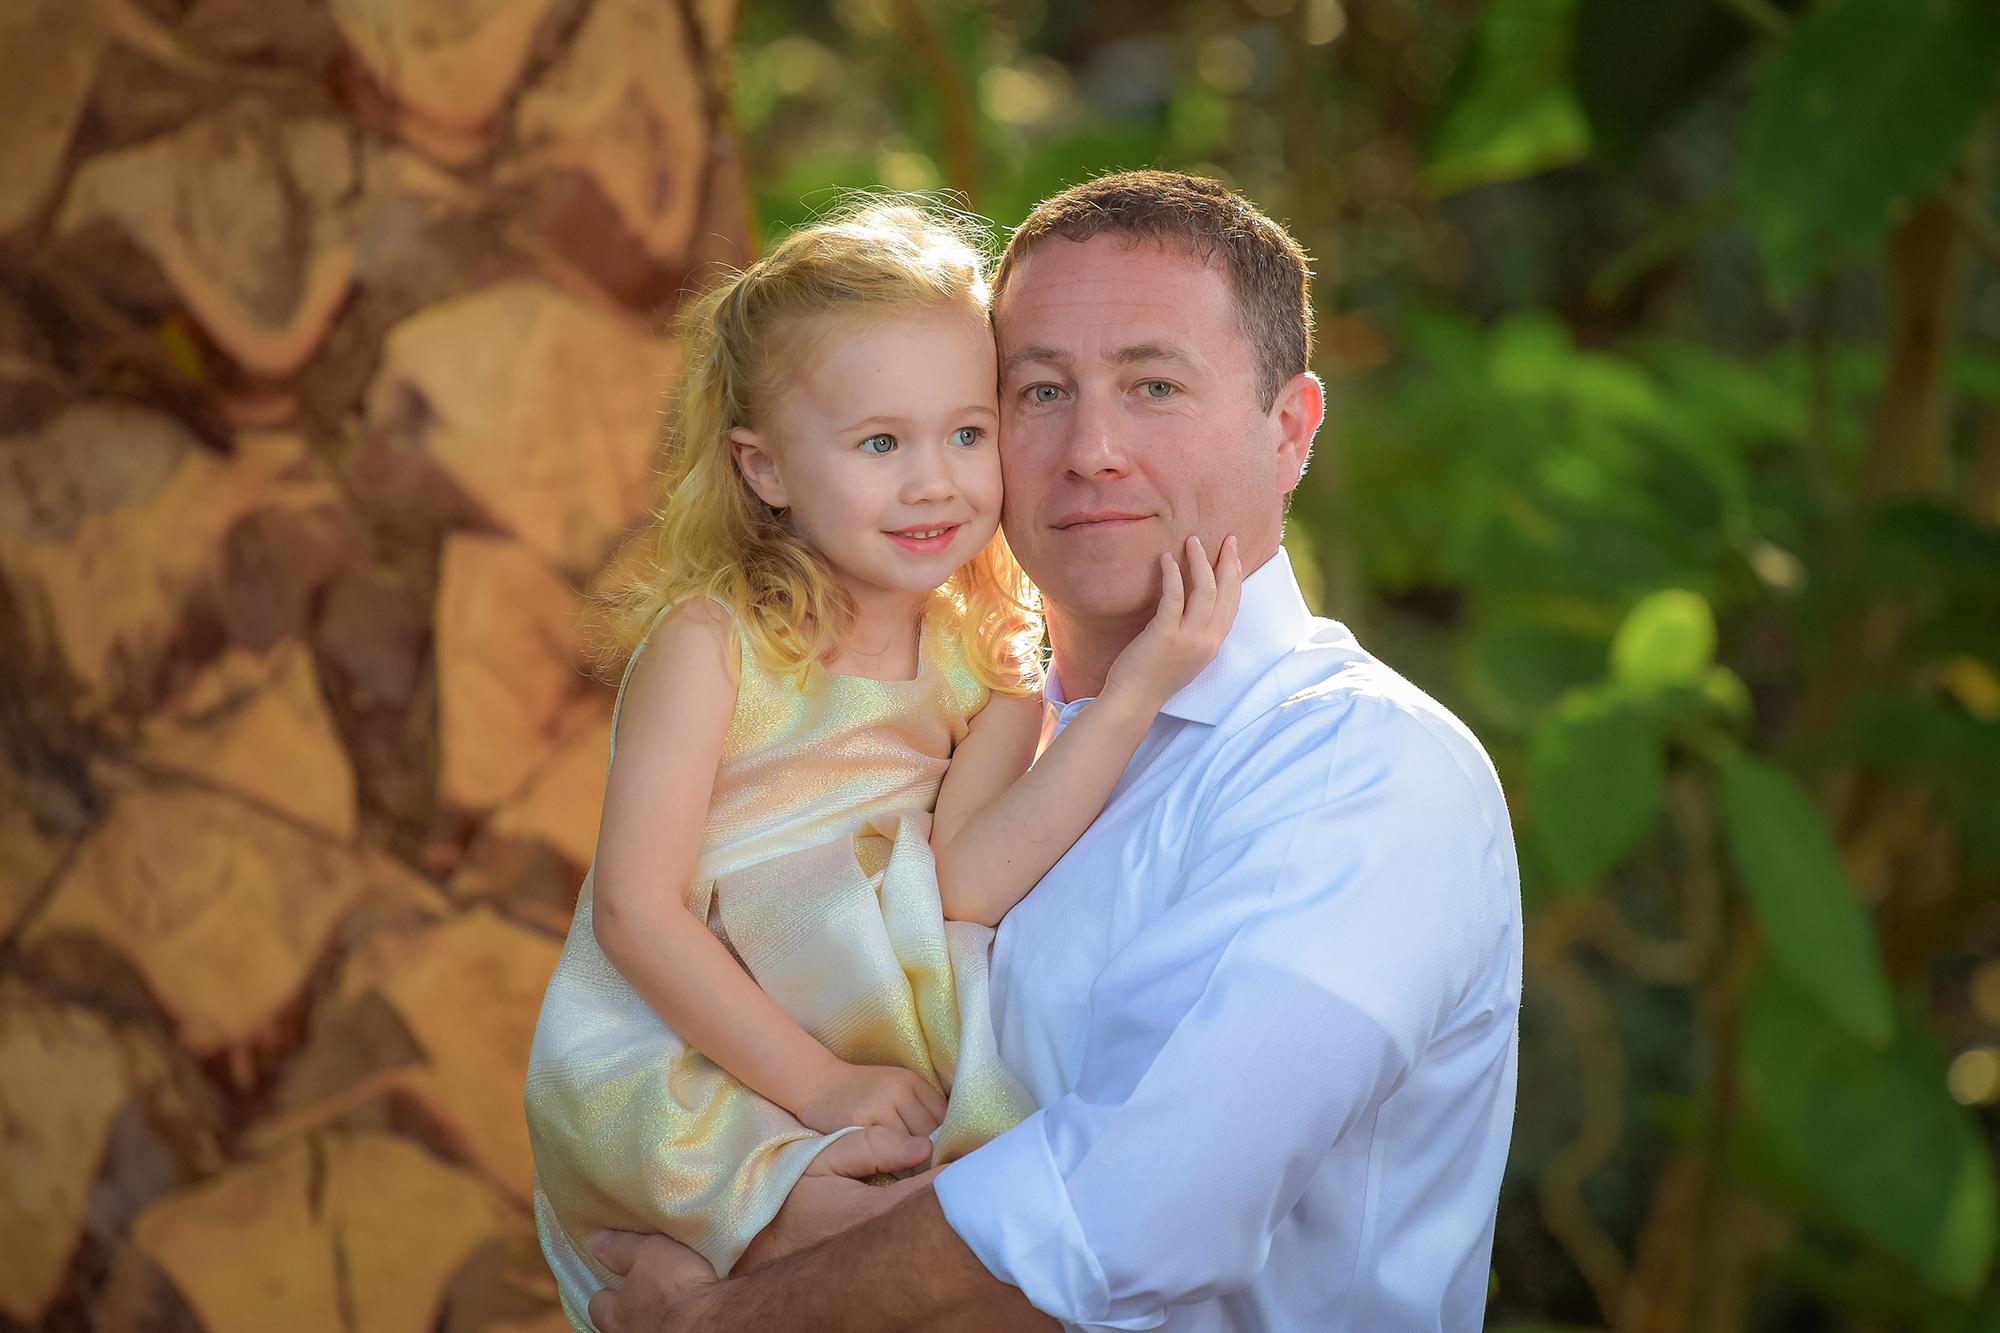 https://bworthyphotography.smugmug.com/BW-Website-Family-Session/Werbe-Family-Session-2